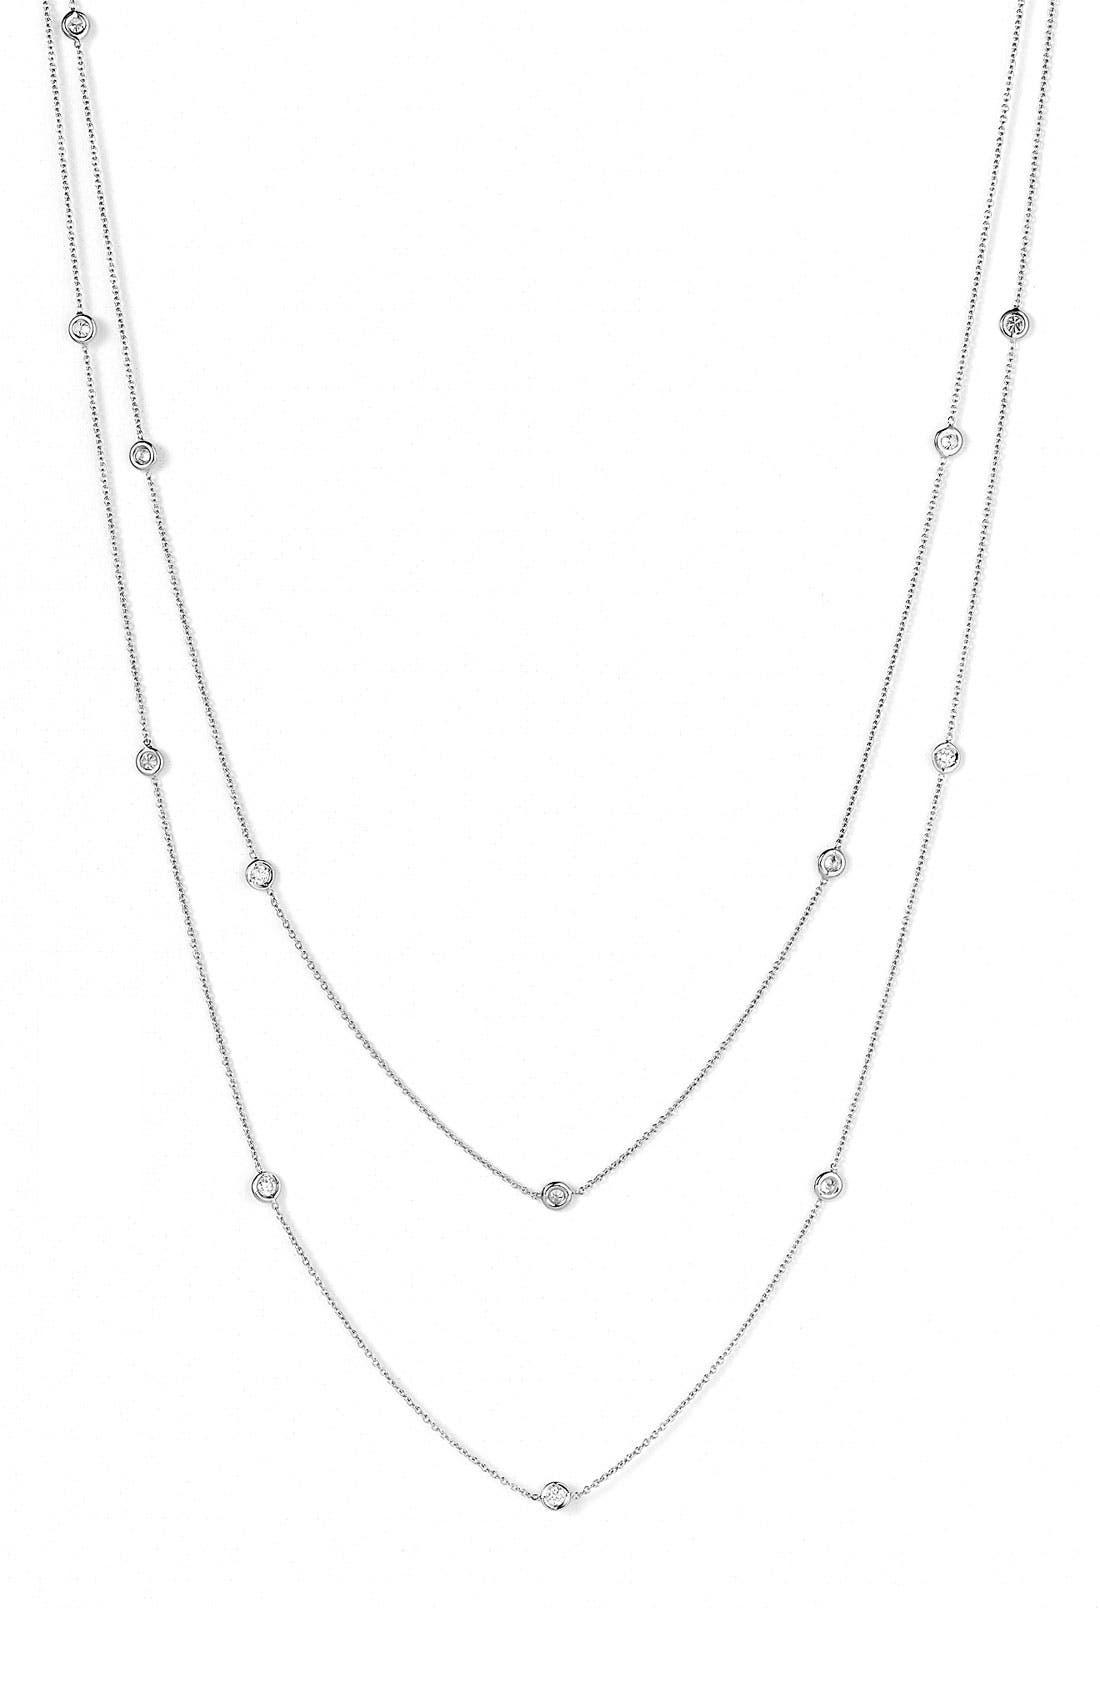 Diamond Station Necklace,                             Alternate thumbnail 5, color,